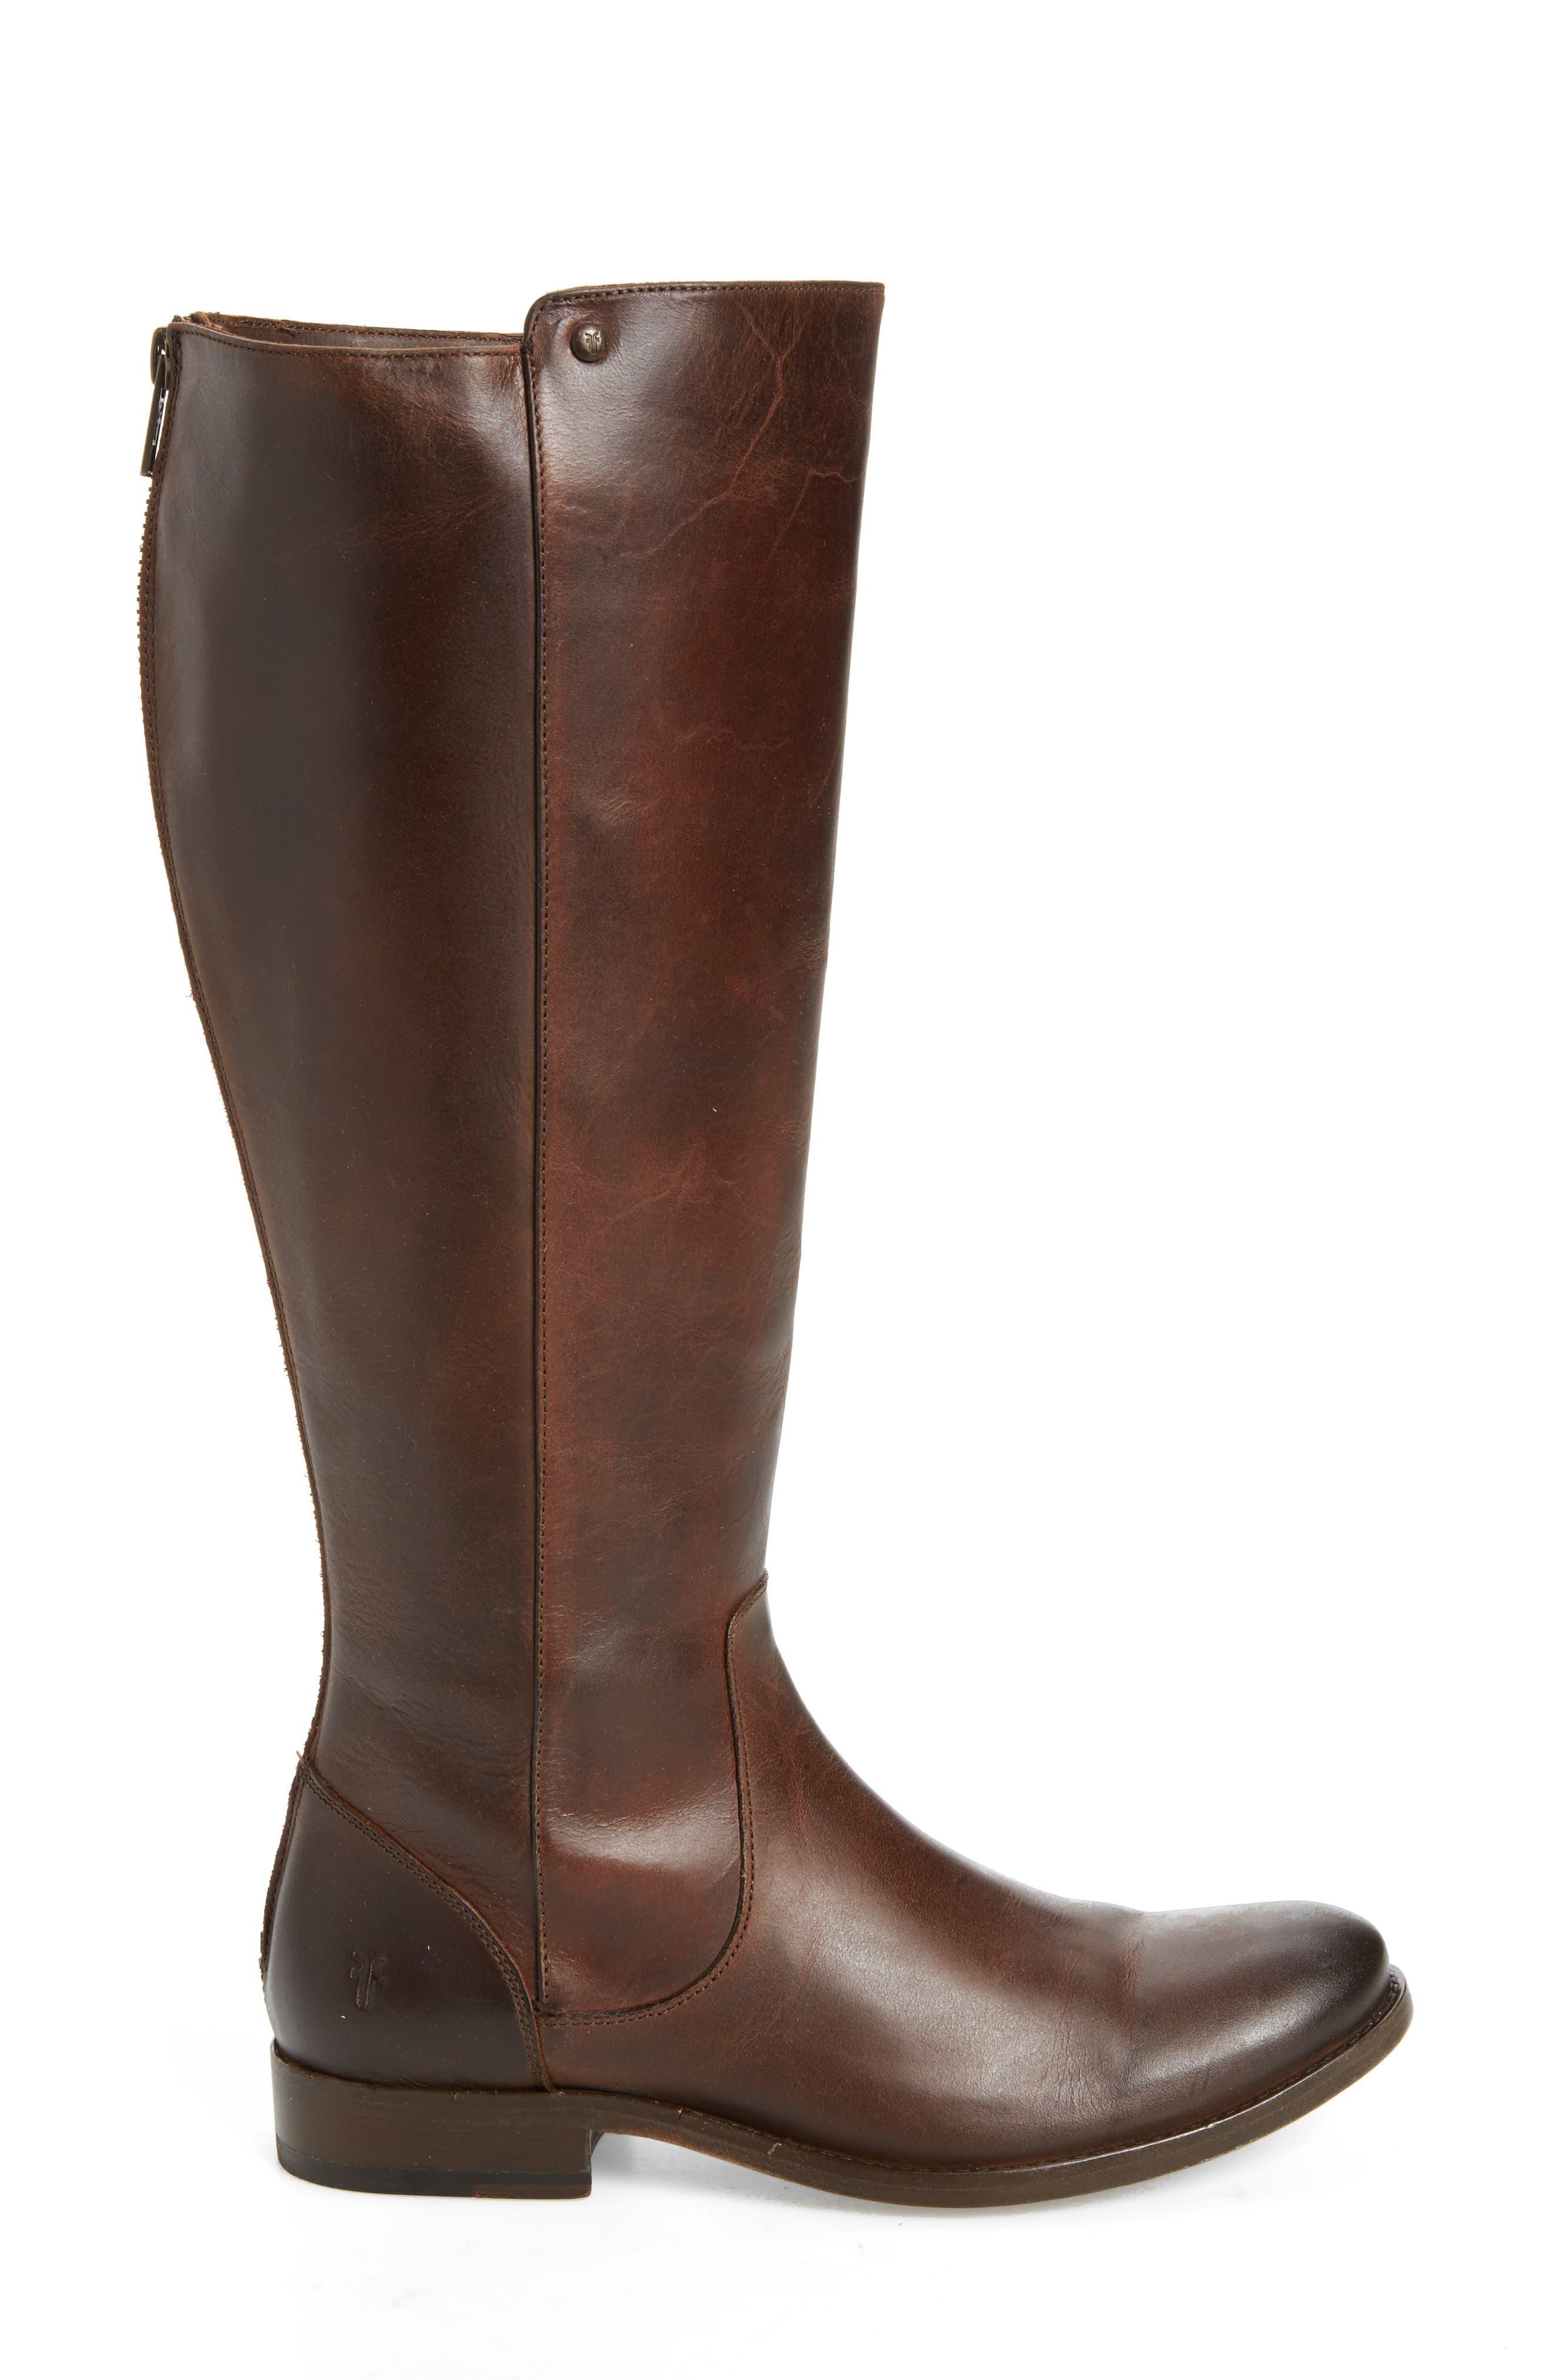 Melissa Stud Knee High Boot,                             Alternate thumbnail 3, color,                             Chocolate Leather